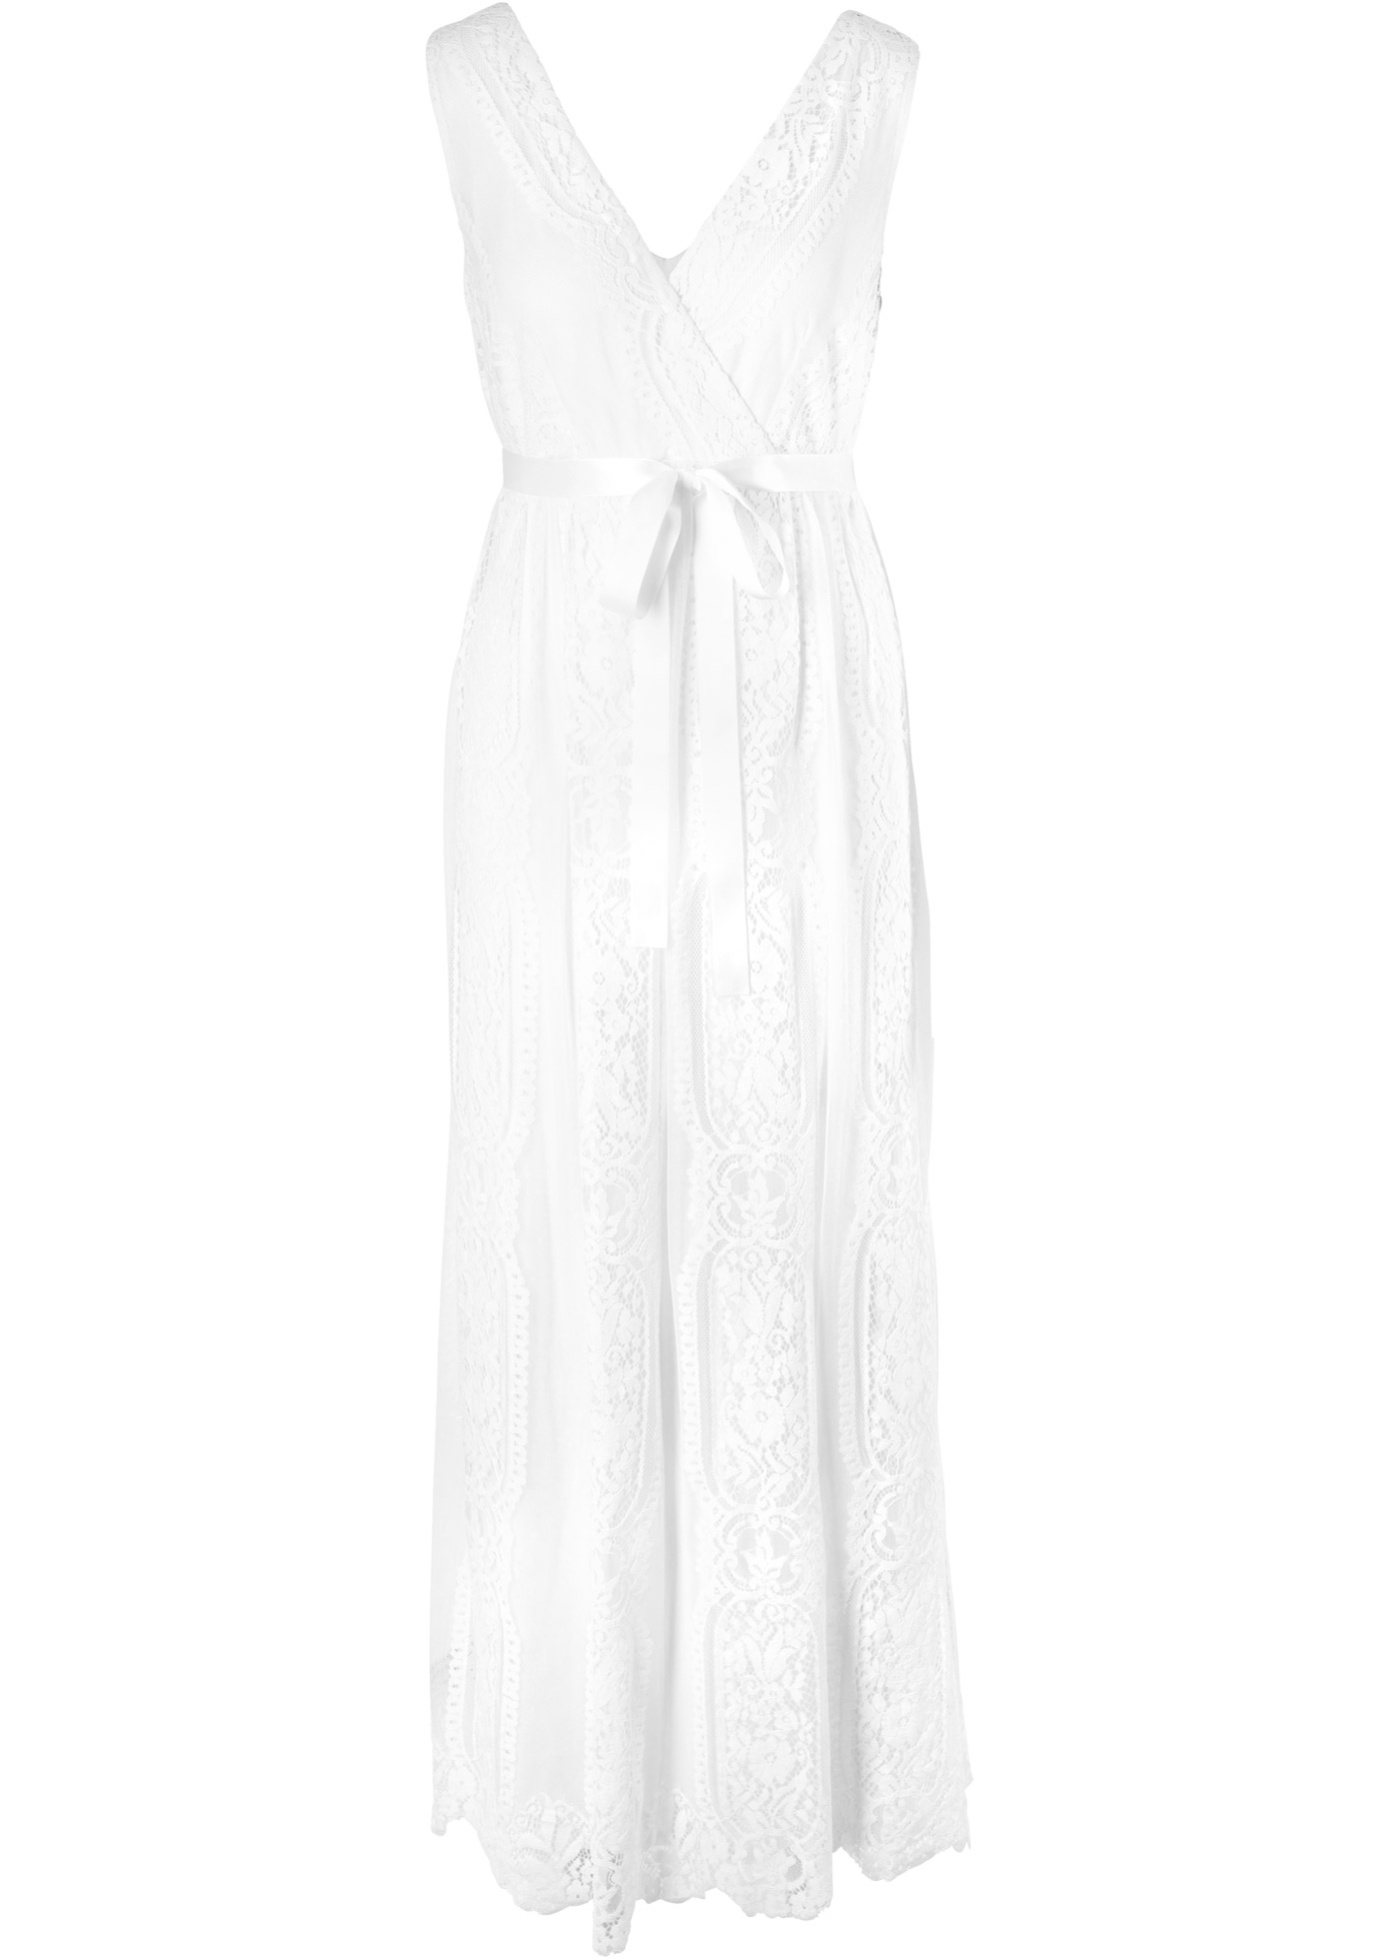 Robe de mariée de grossesse / Robe de cérémonie de grossesse